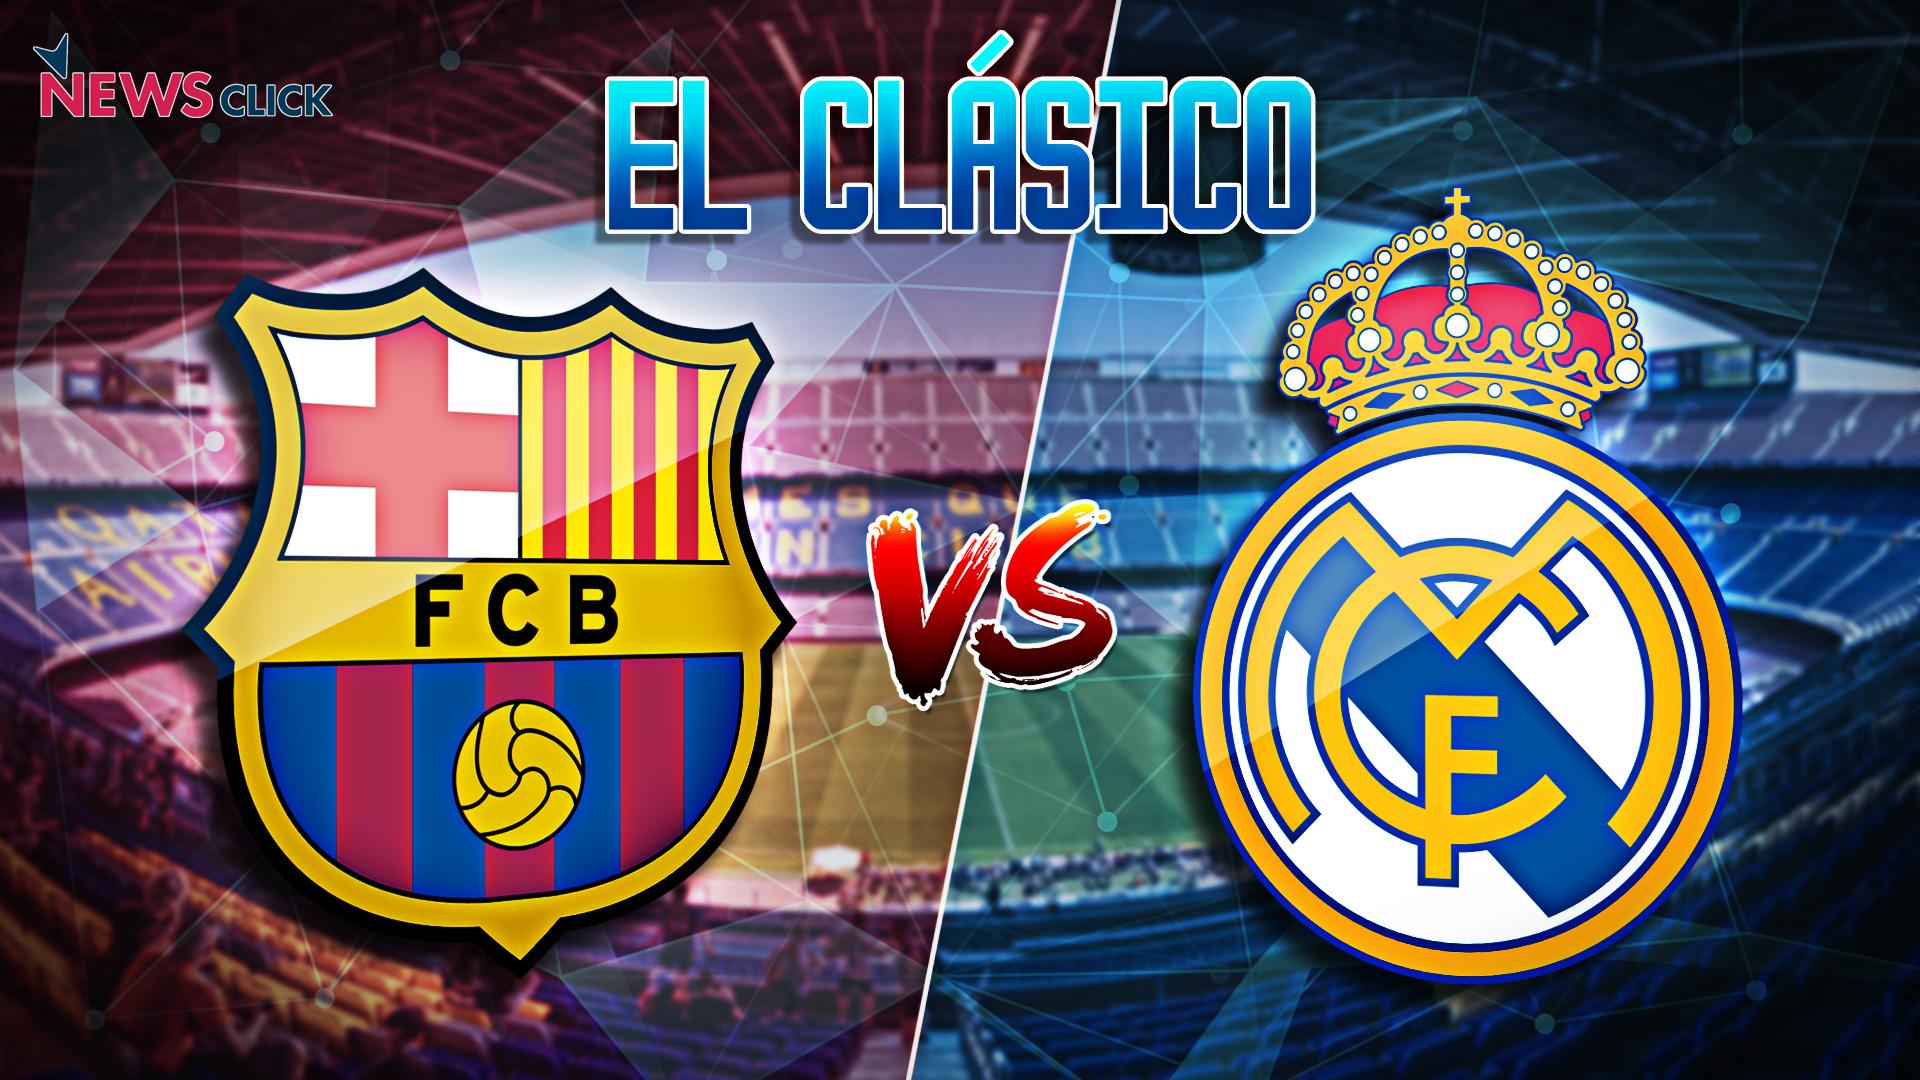 buy online ccc25 a46ac El Clasico La Liga clash between FC Barcelona and Real Madrid